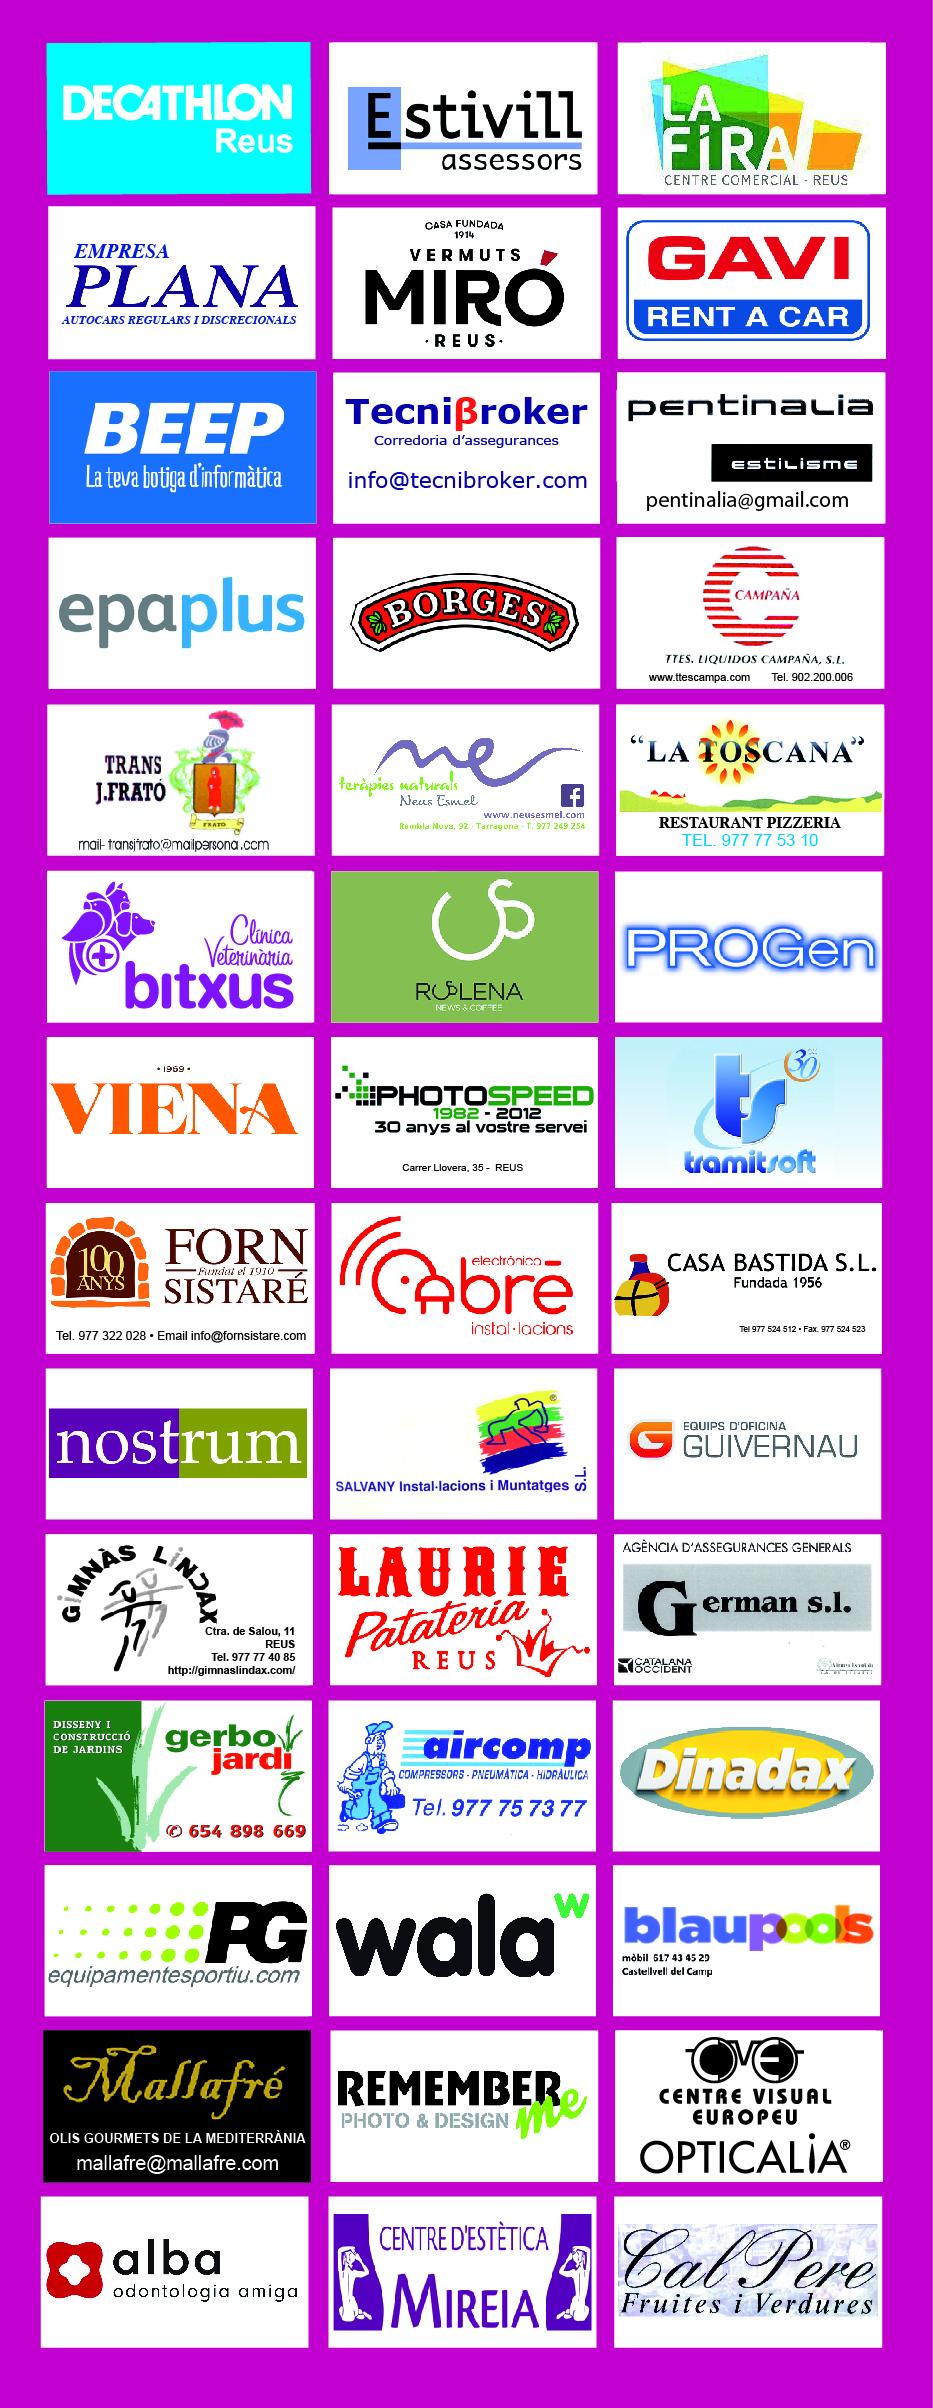 logos columnes-02_ok_12_04.jpg (1.34 MB)